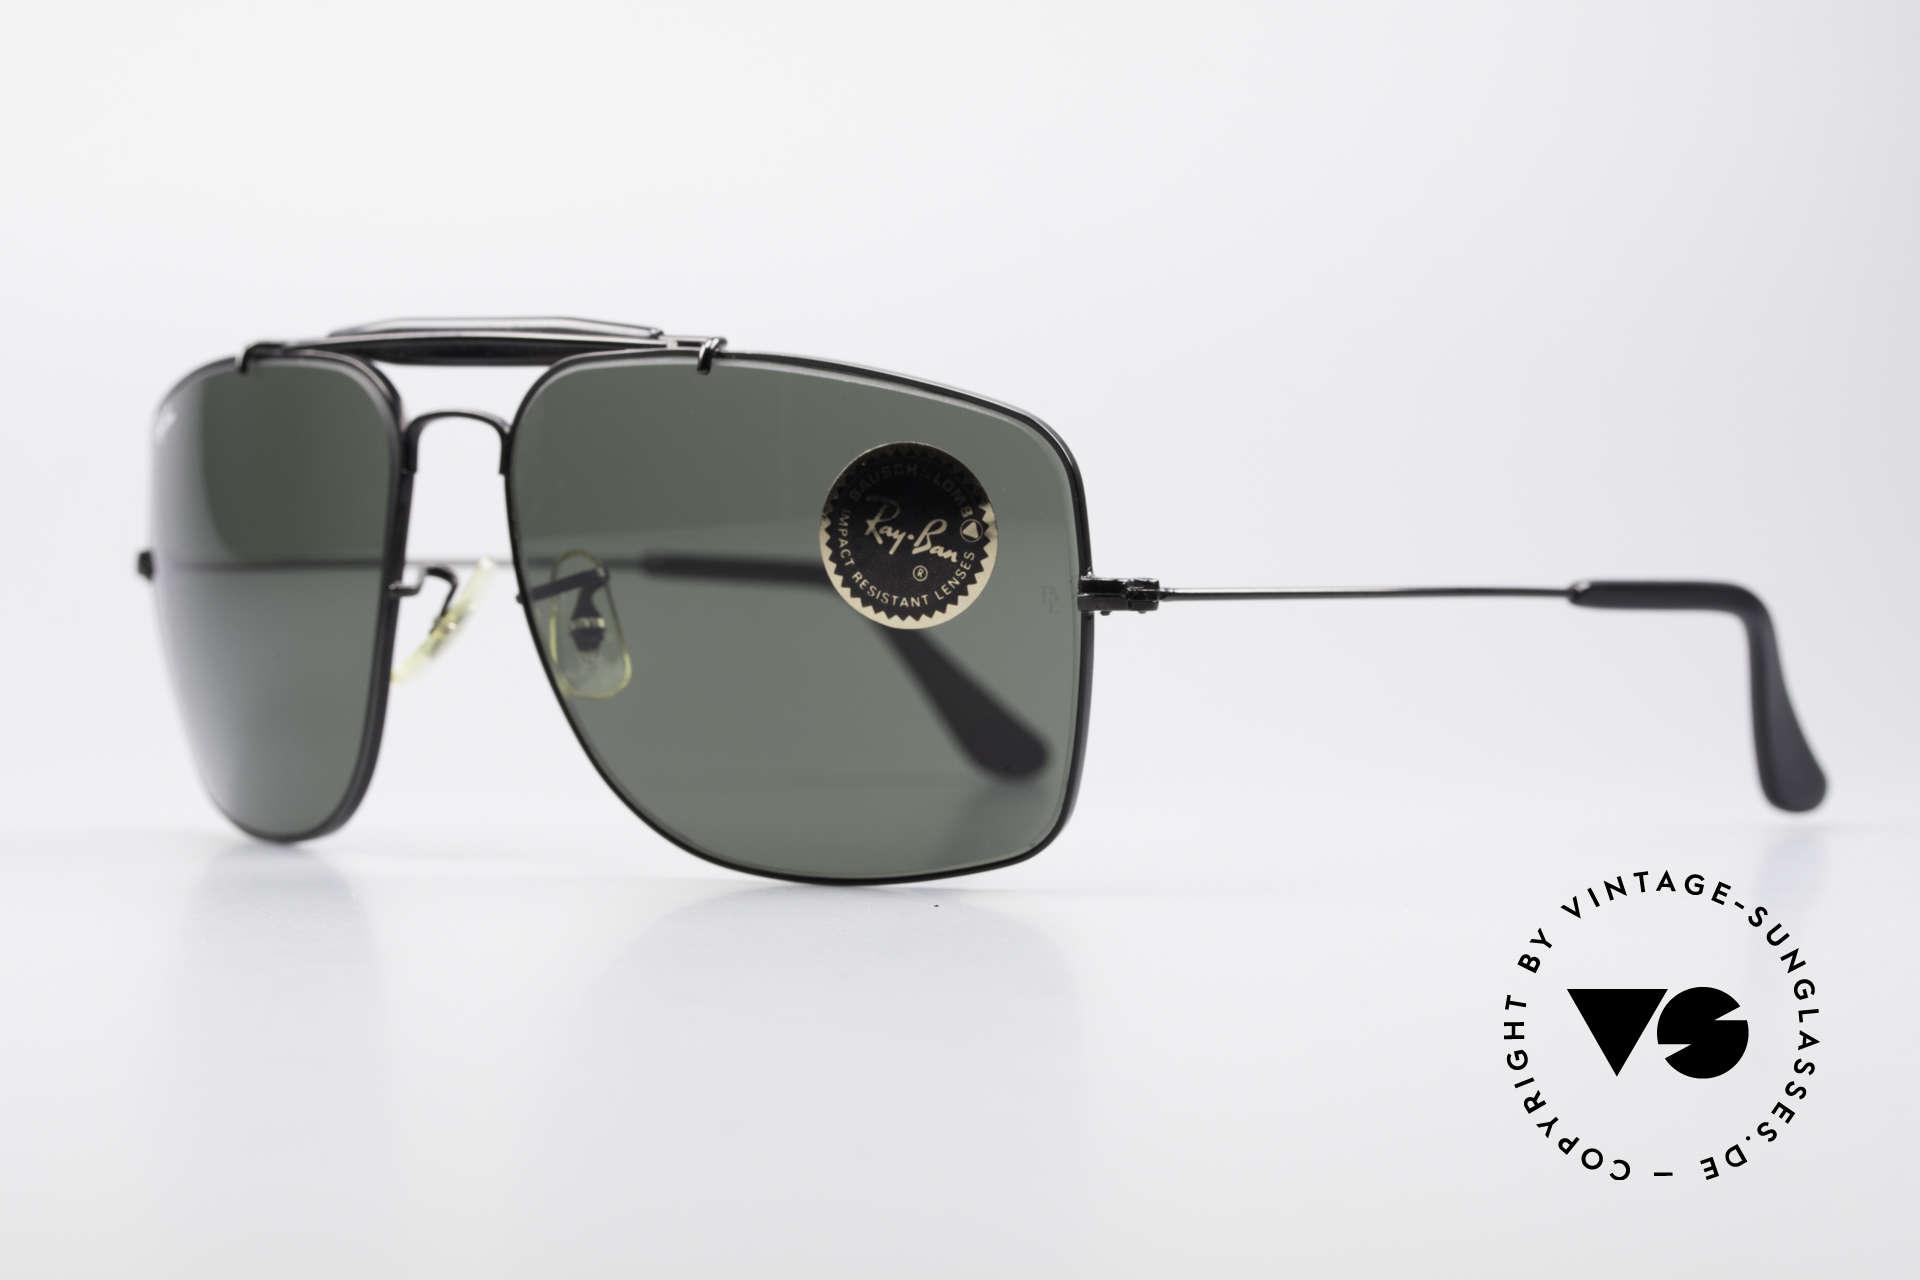 Ray Ban Explorer Large Old B&L USA Ray-Ban Shades, green G15 Bausch & Lomb B&L mineral lenses, Made for Men